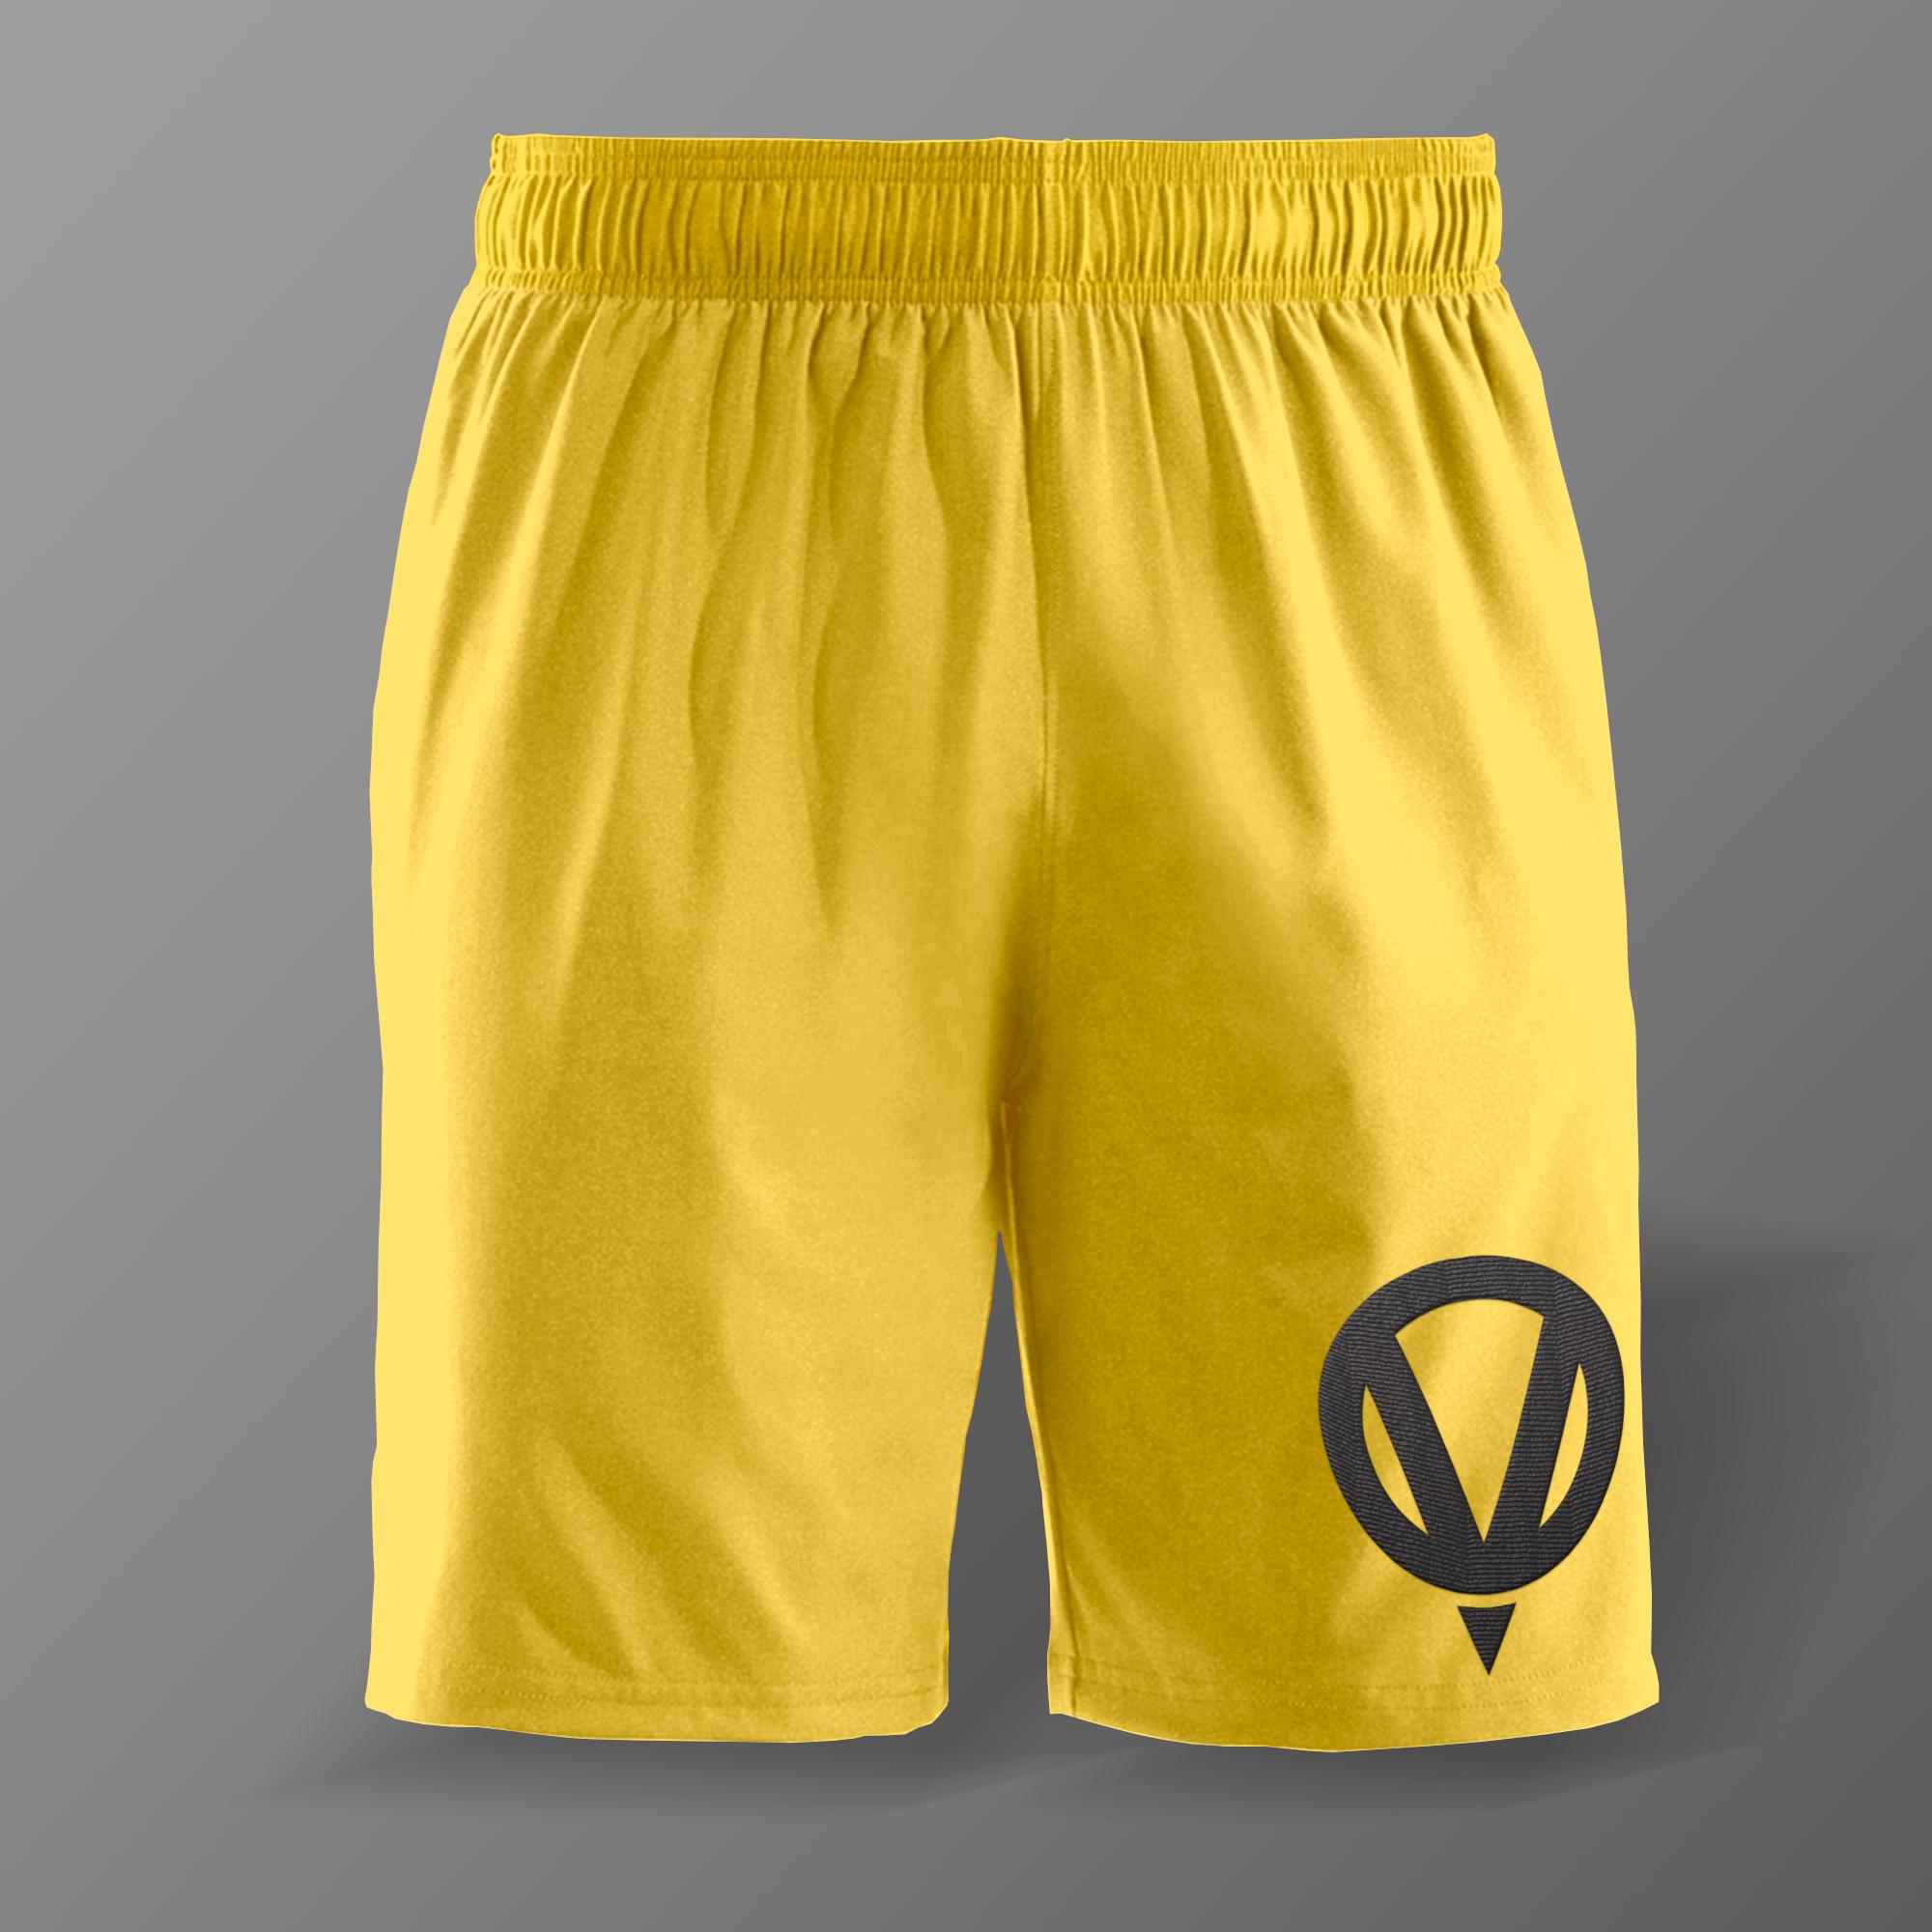 Shorts-Frente_MockUp_LeoDesignsStuff_001.png